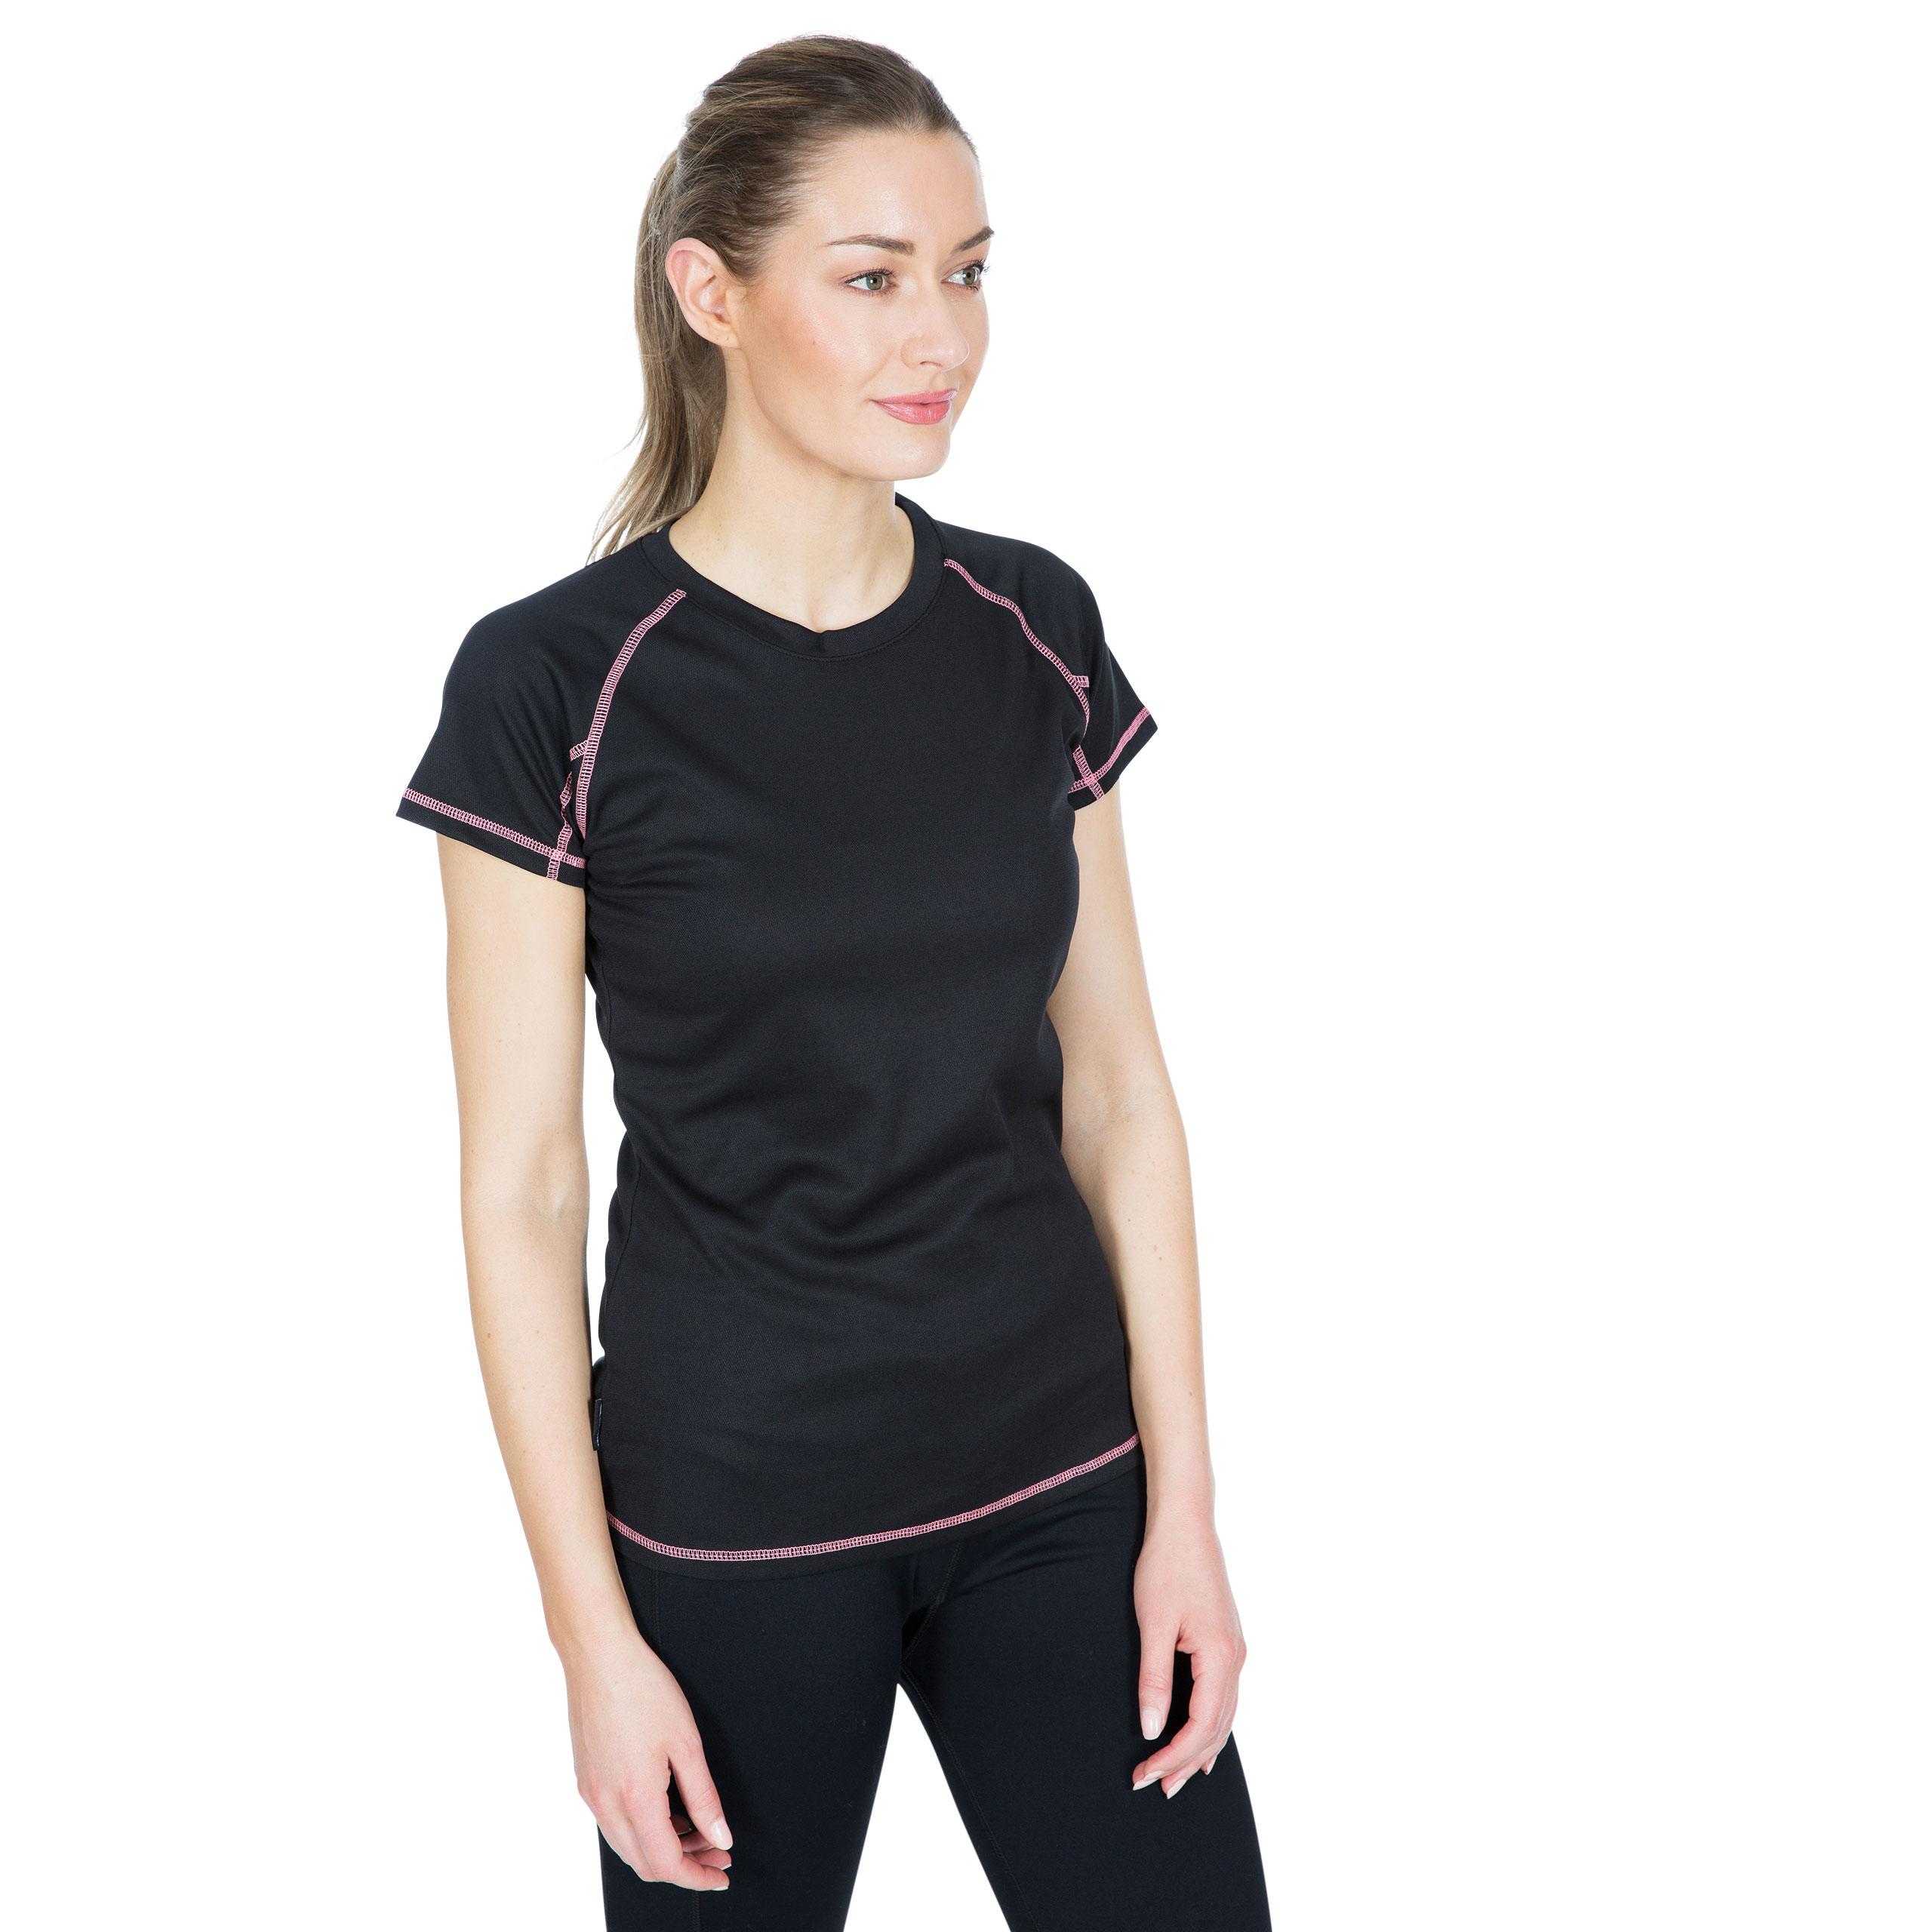 Trespass-Viktoria-Womens-Short-Sleeved-Active-T-Shirt-Gym-Top-For-Ladies thumbnail 15